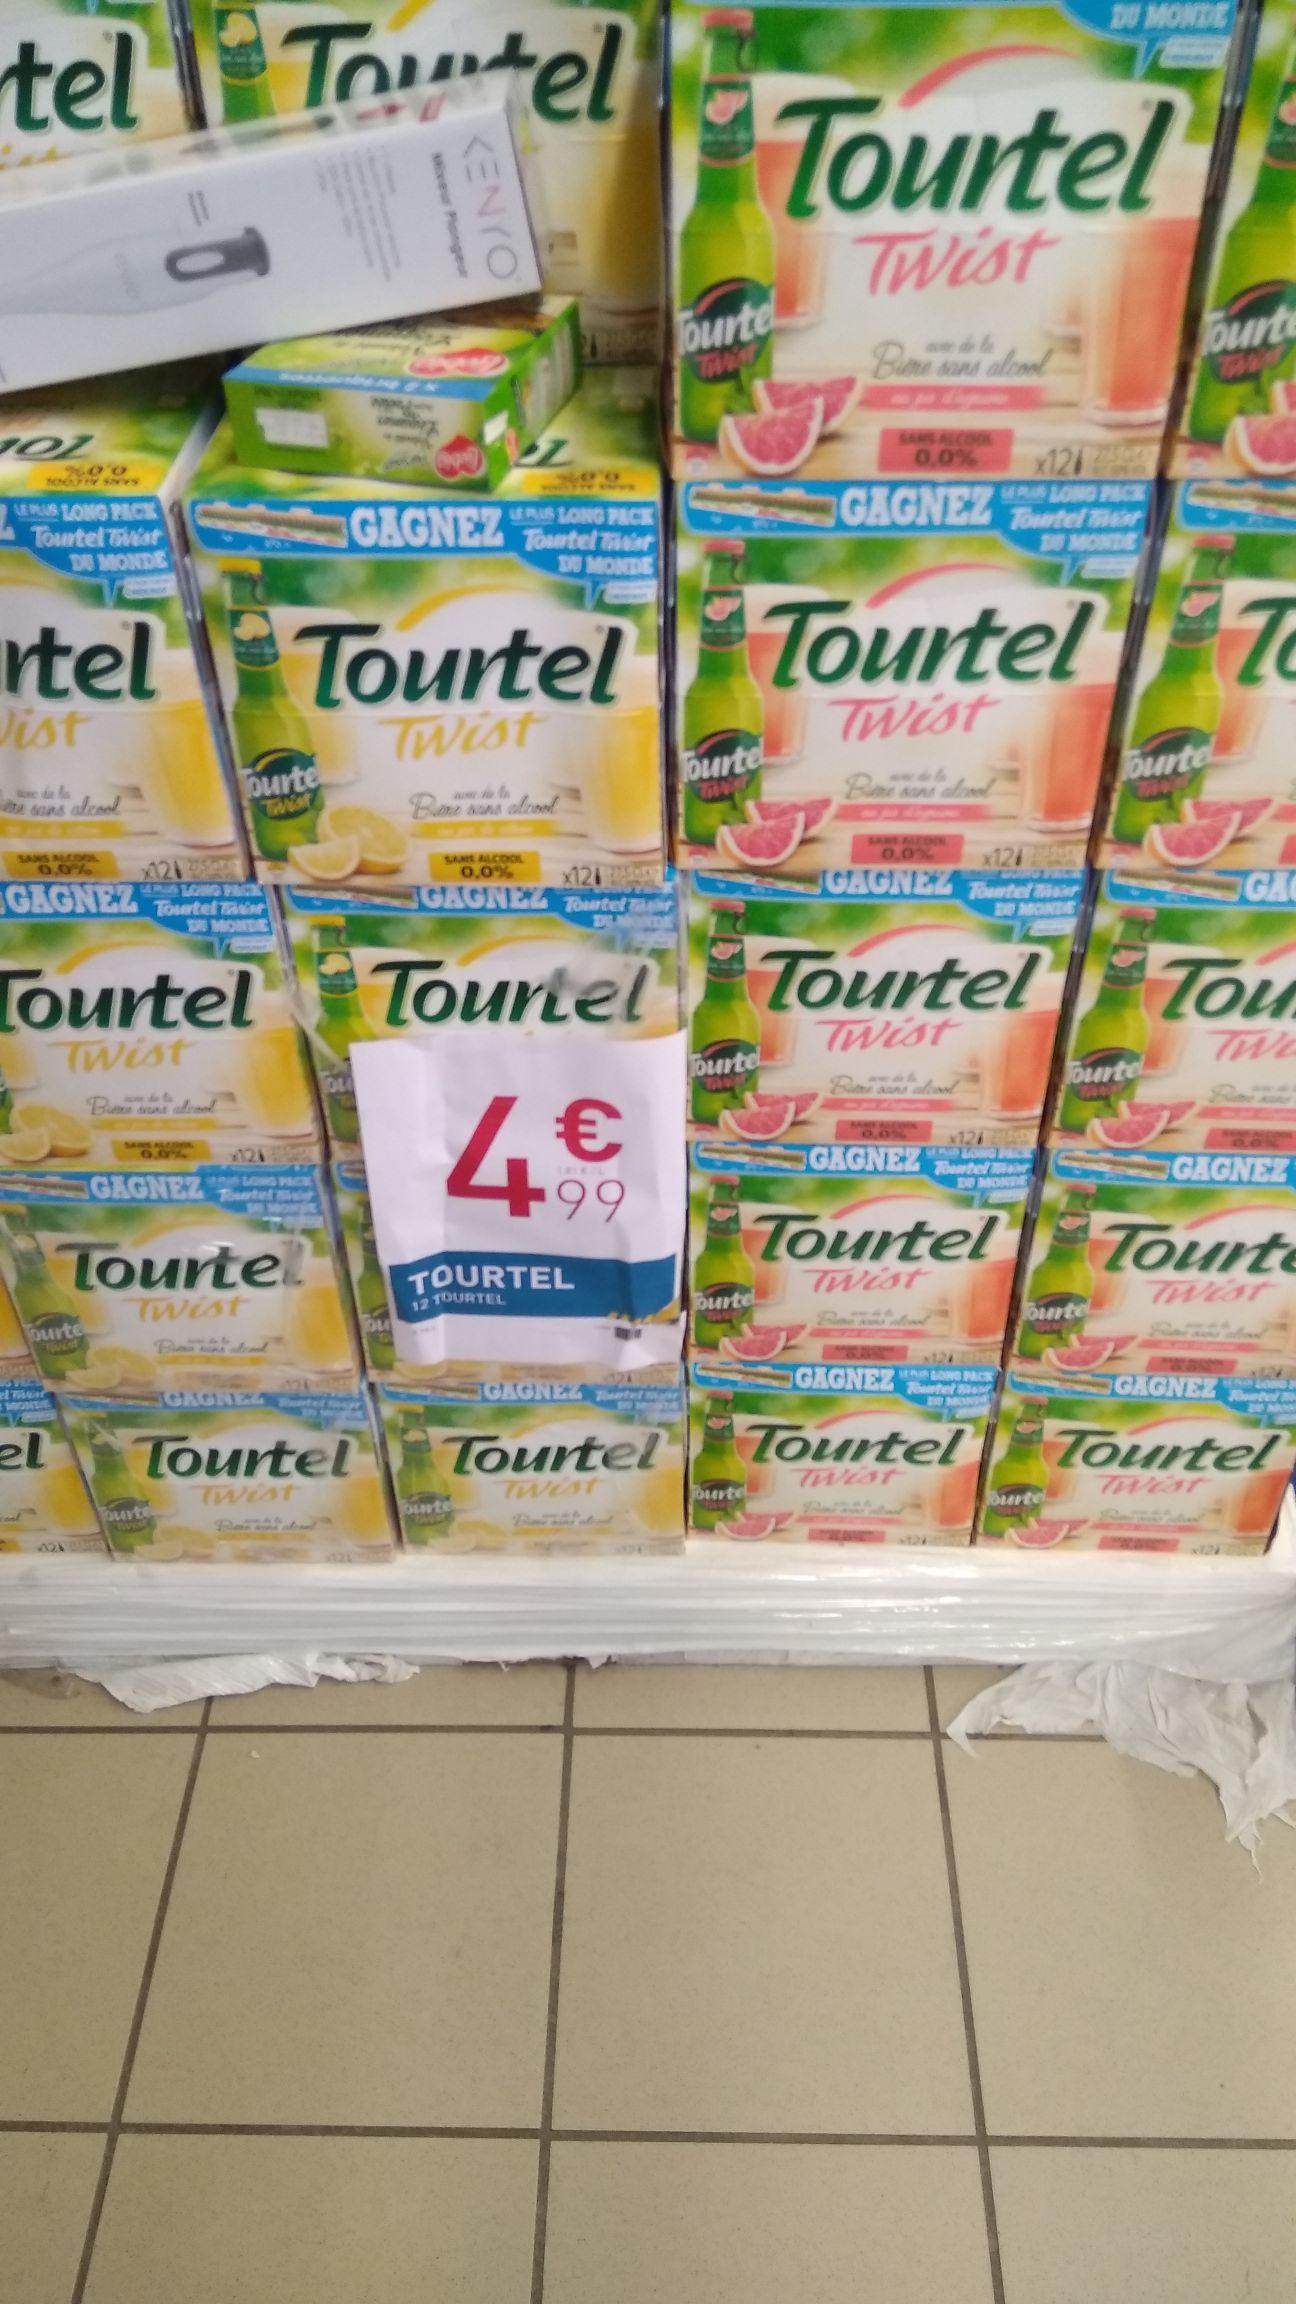 Pack Tourtel Twist Agrumes ou Citron 12 x 27.5cl - Saint-Ouen l'Aumône (95) Nîmes (30) Avignon (84)